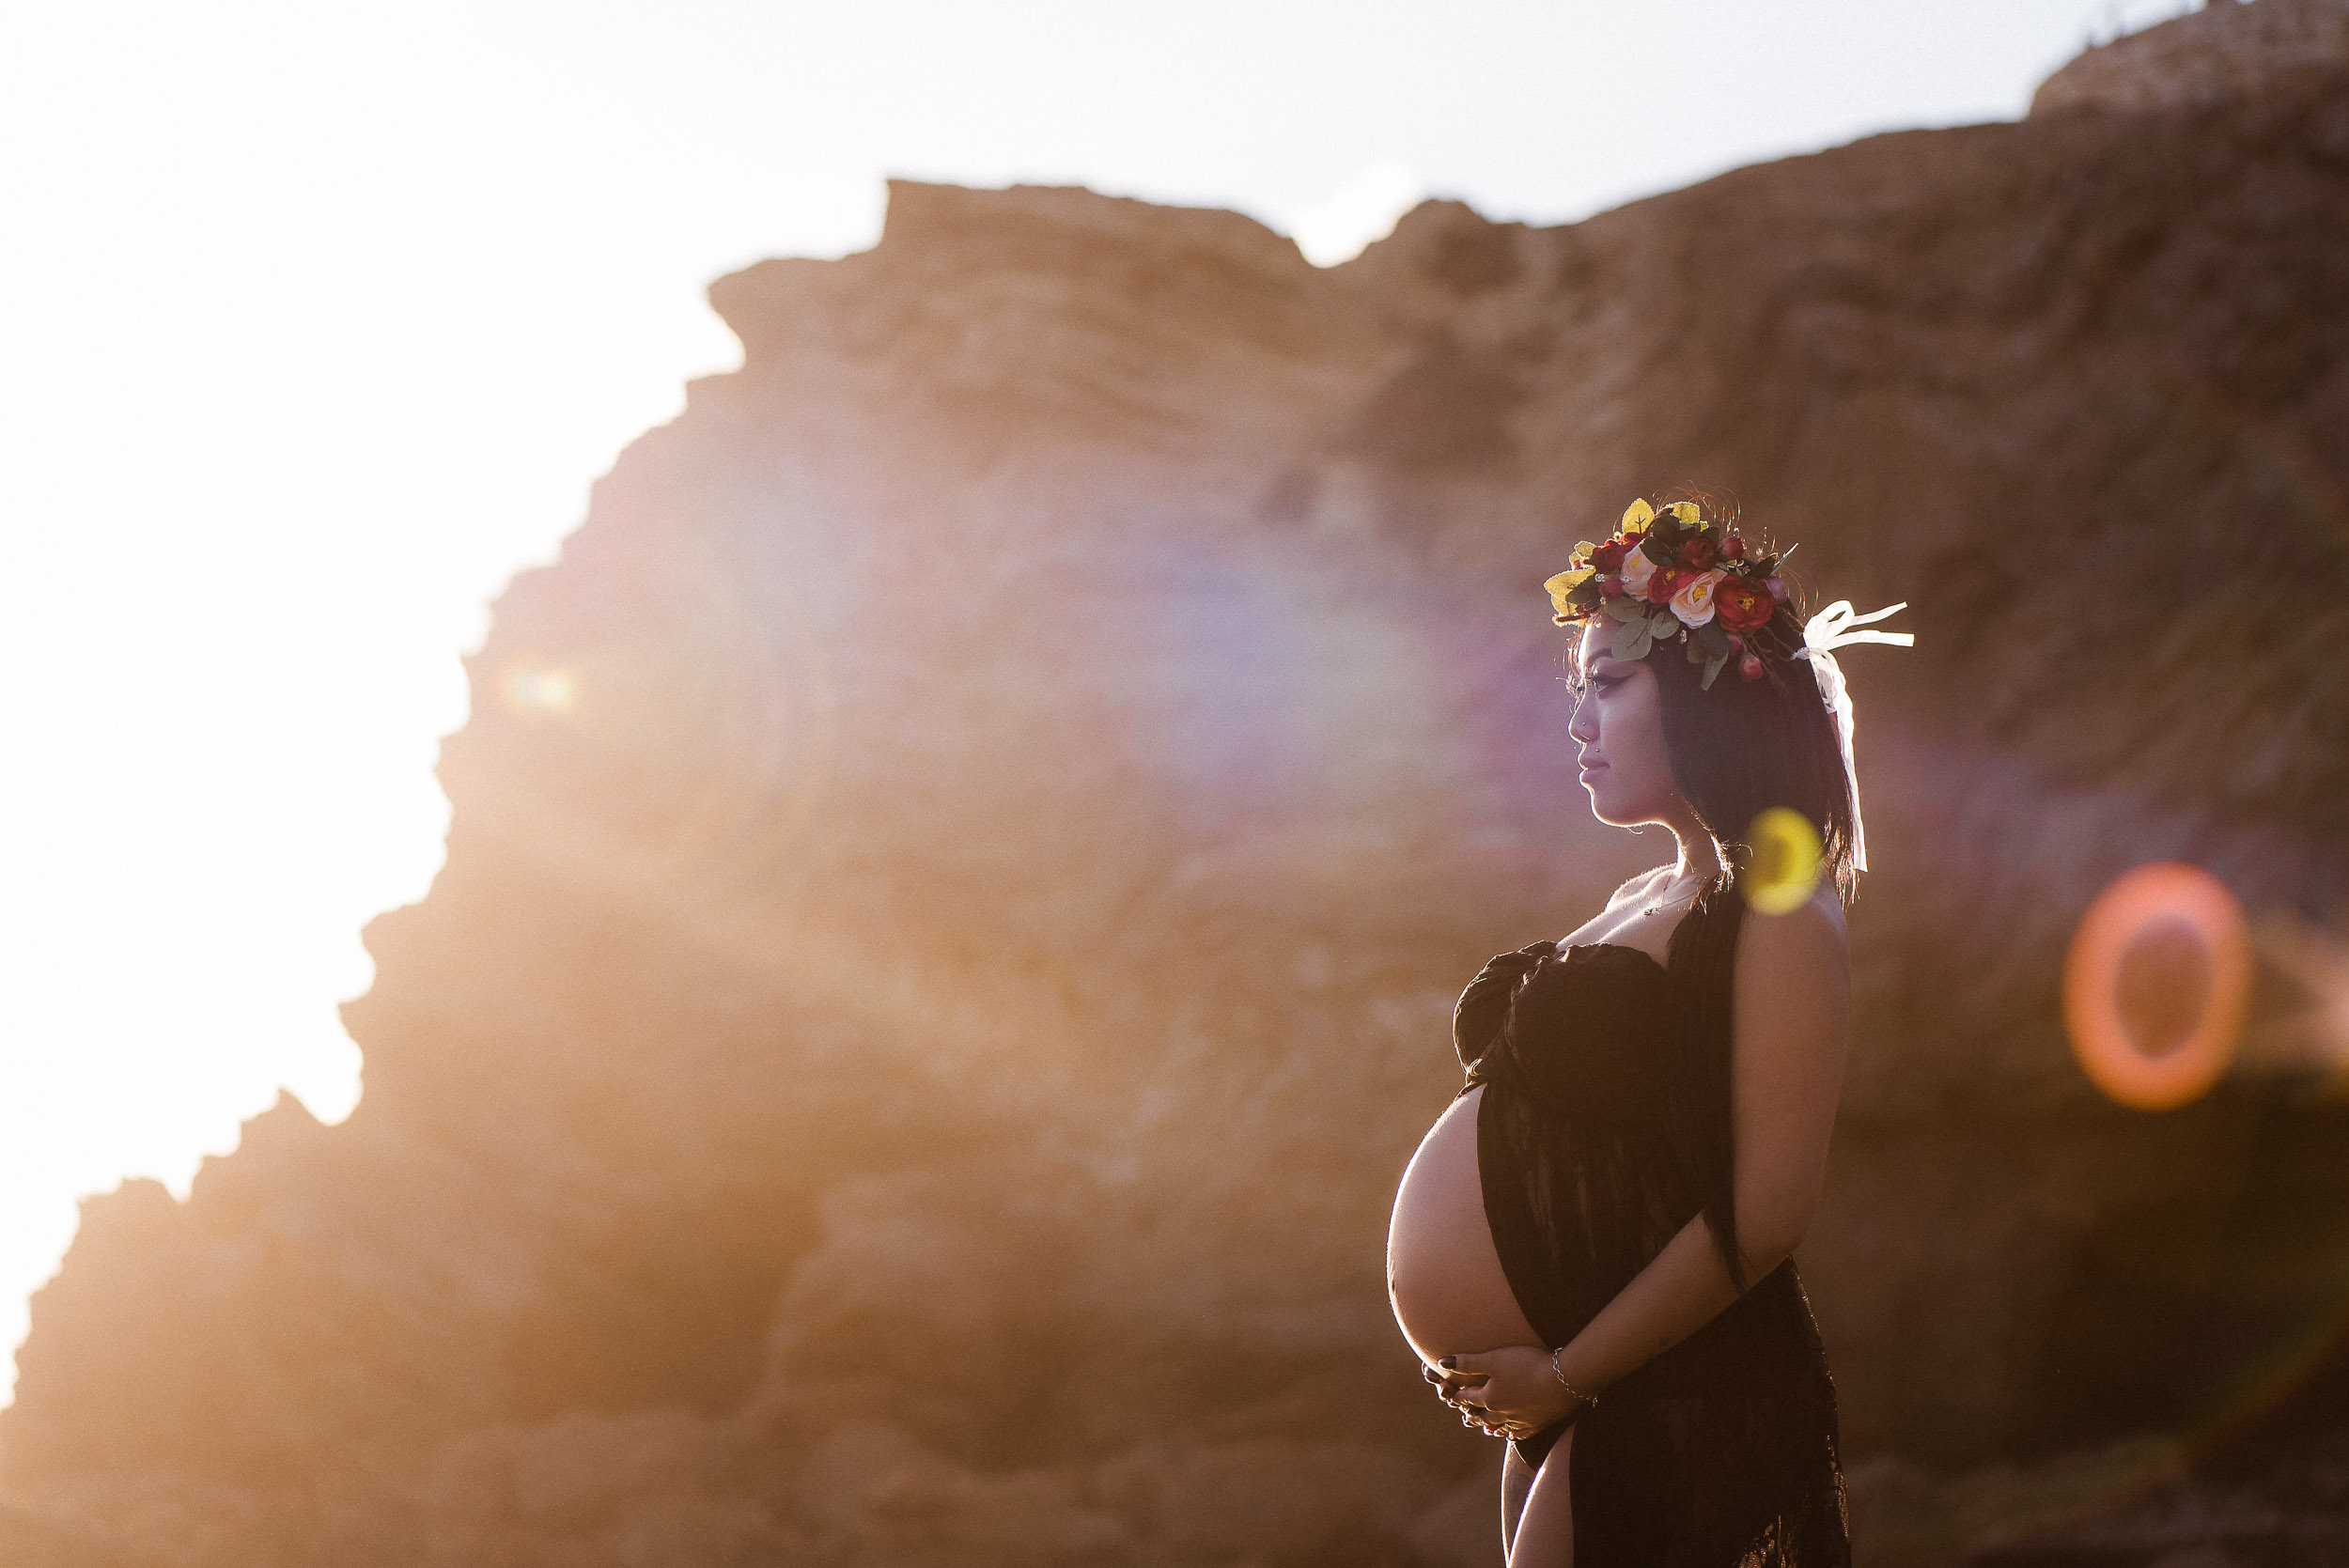 Miraflor-Photo-Peter-Crystal-Maternity-Photoshoot-Newport-Beach-20180317-042.jpg